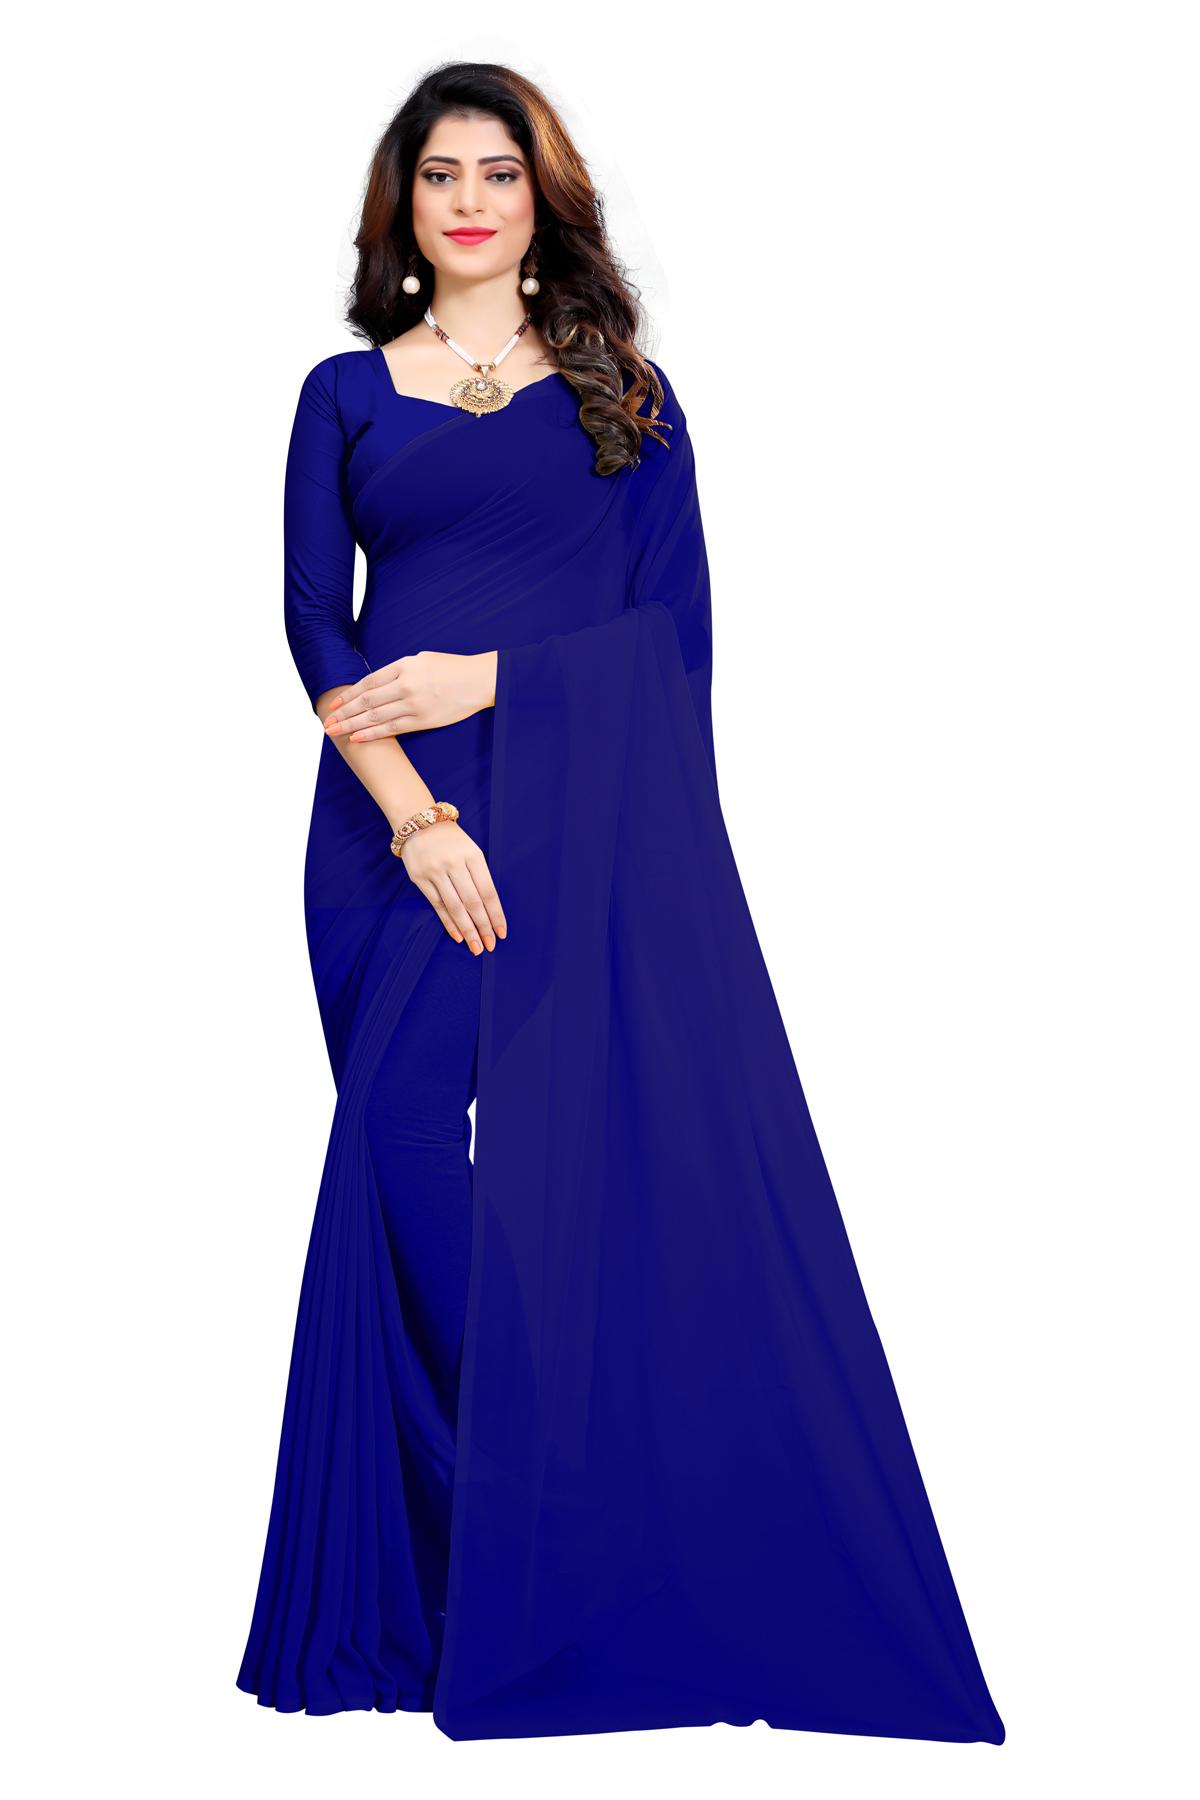 Royal Blue Sarees Buy Online For Women At Best Kemeja Lavender Contrast Multicolor Shop Velvet Prices